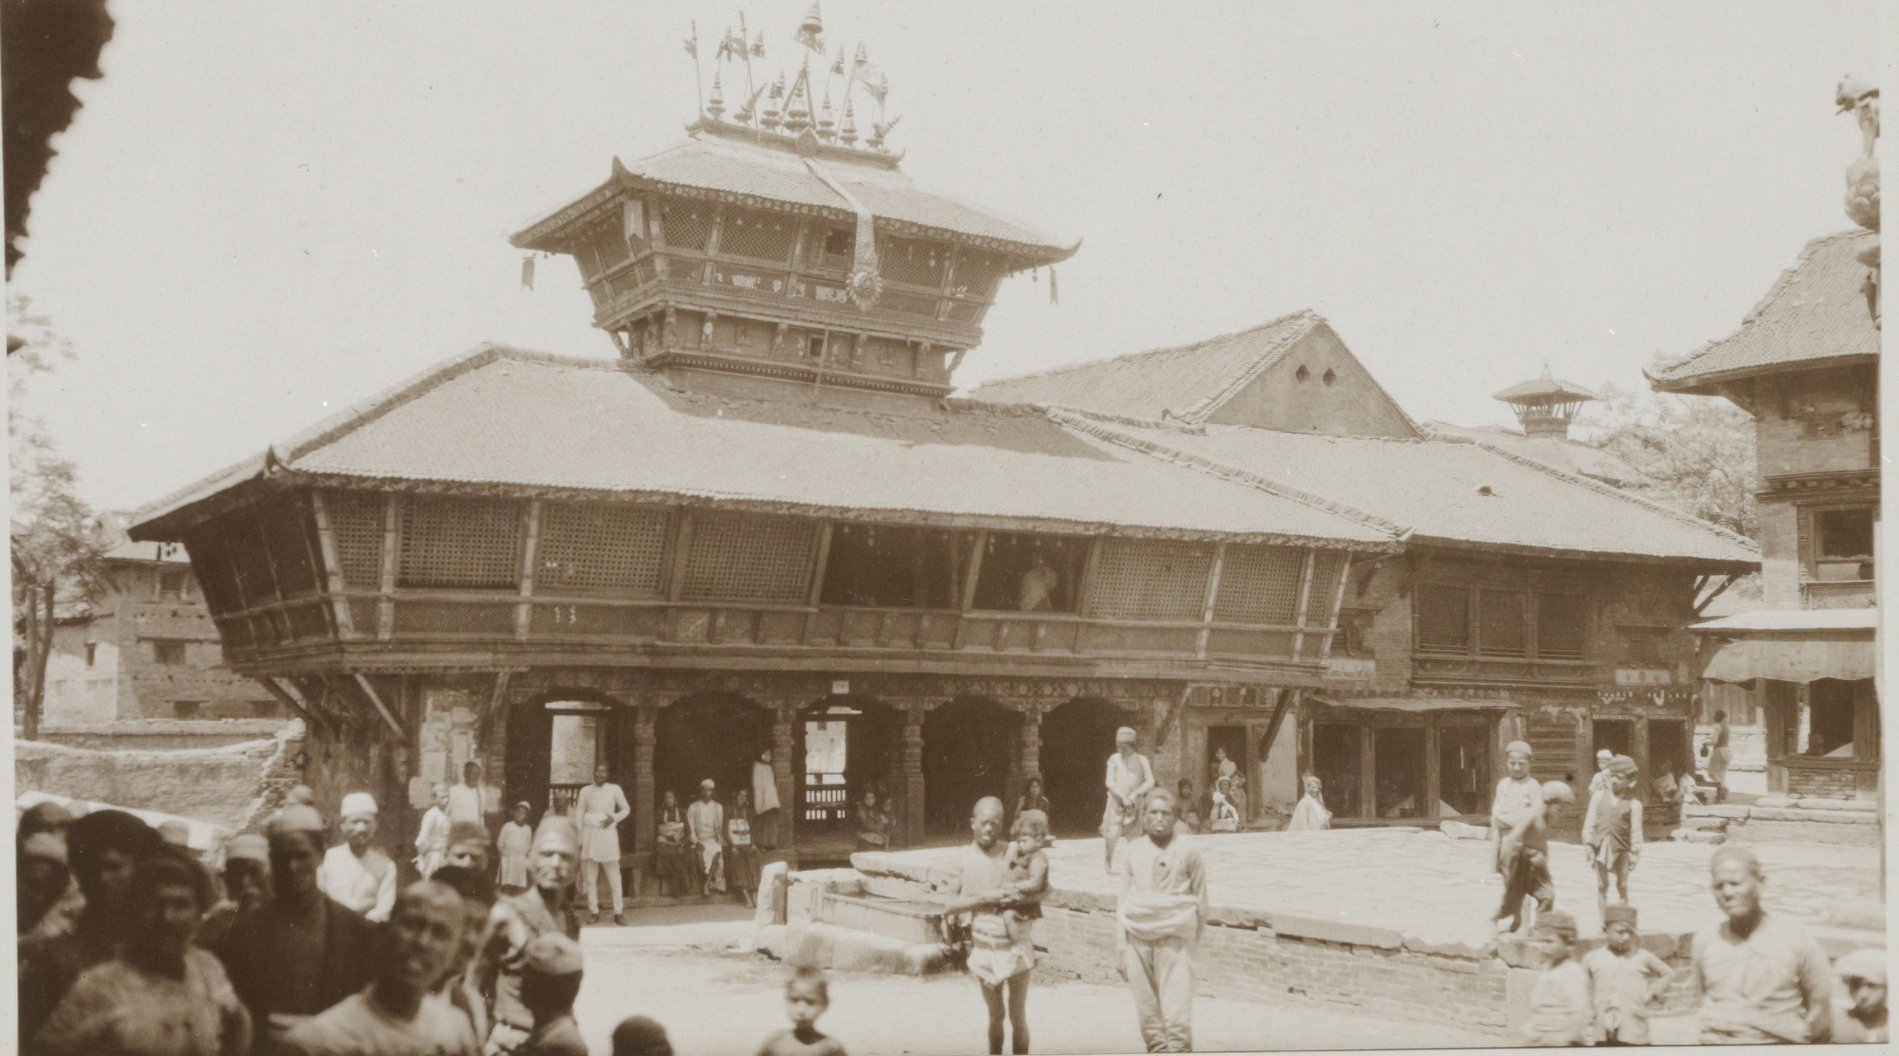 Bhimsen Mandir 1932-34 image